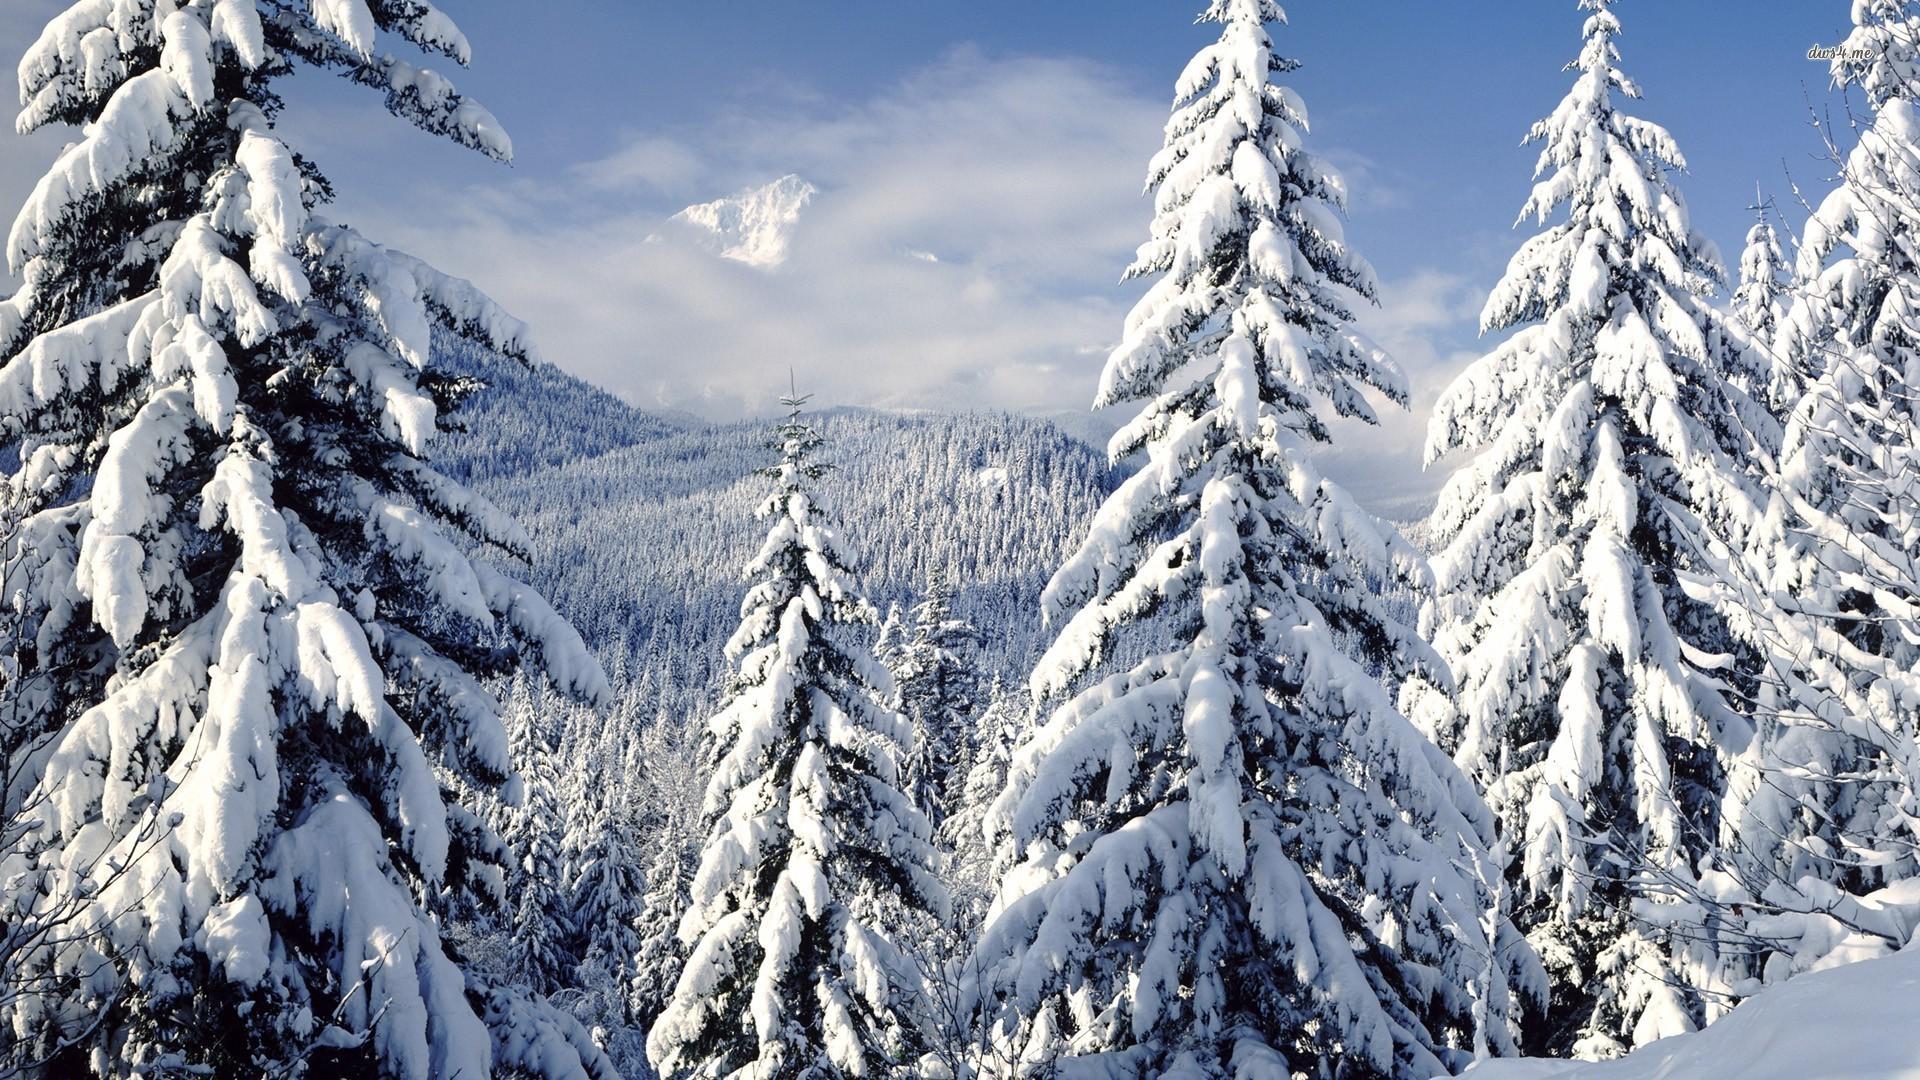 Snowy trees wallpaper 1920x1080 1920x1080